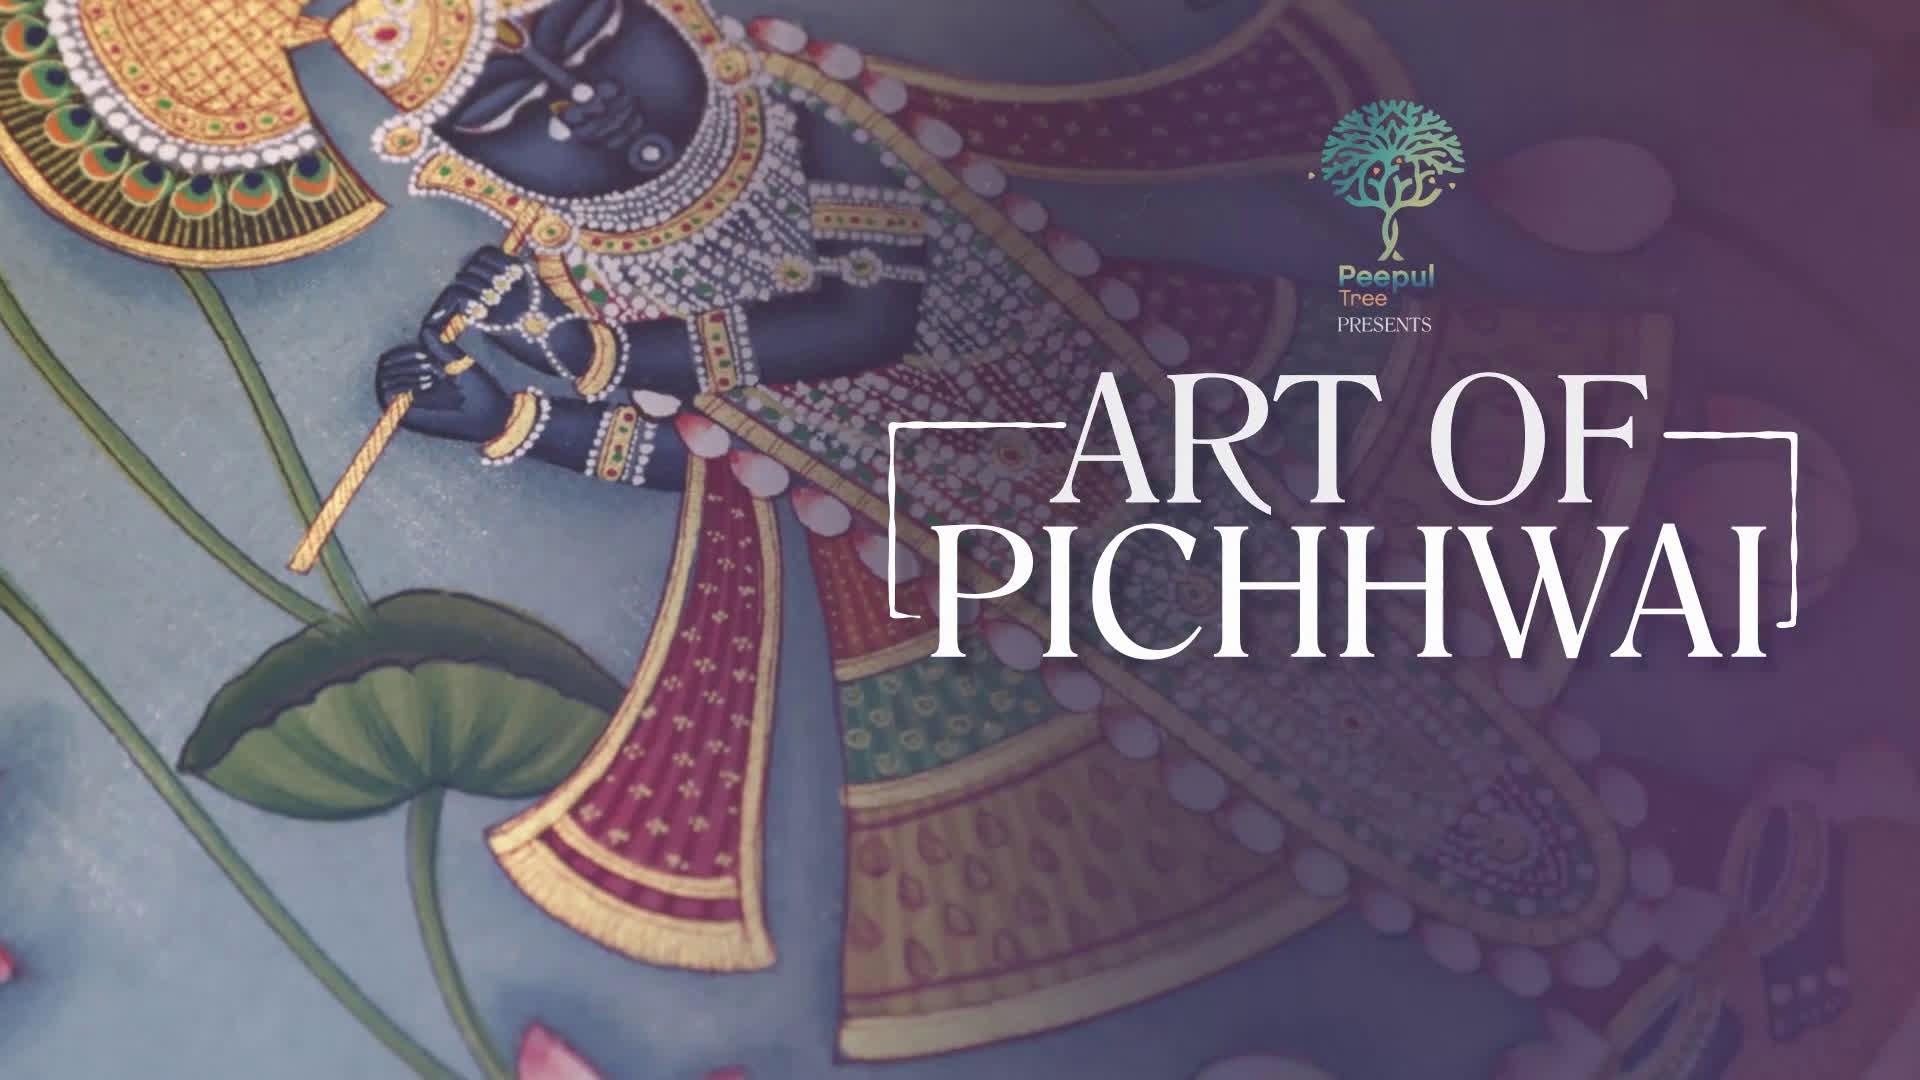 The Art of Pichhwai